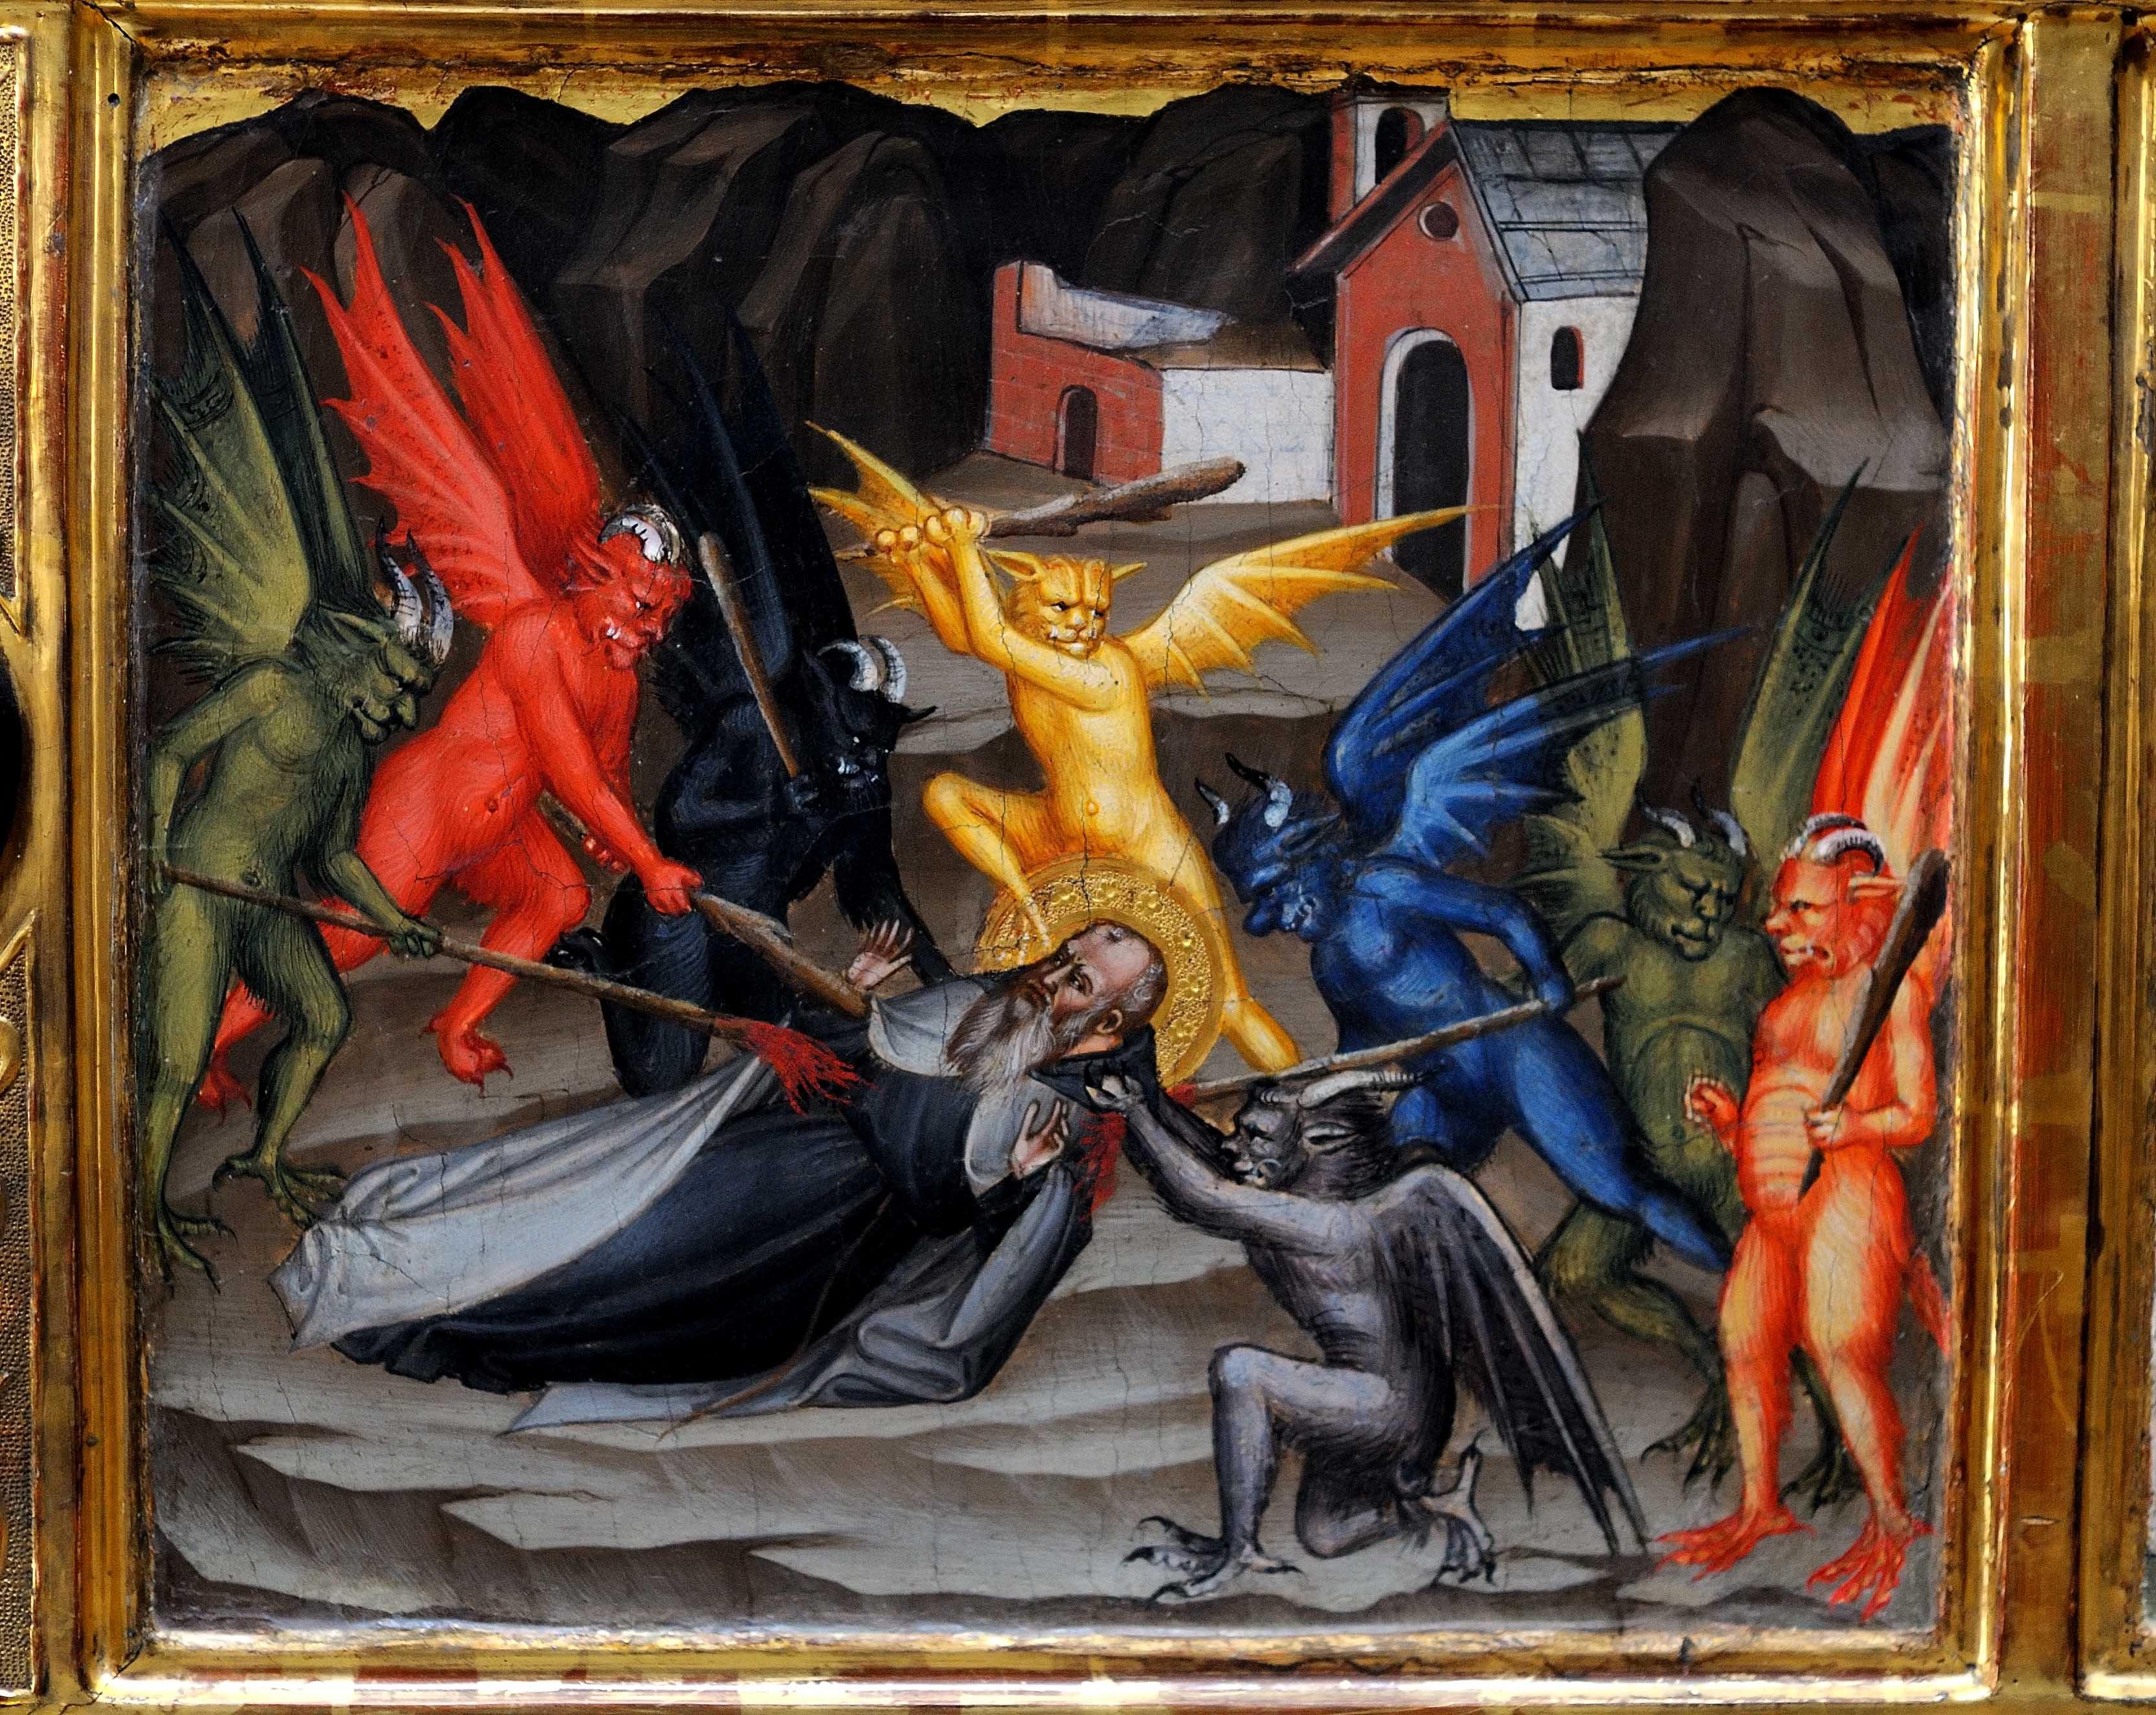 Demons | ferrebeekeeper